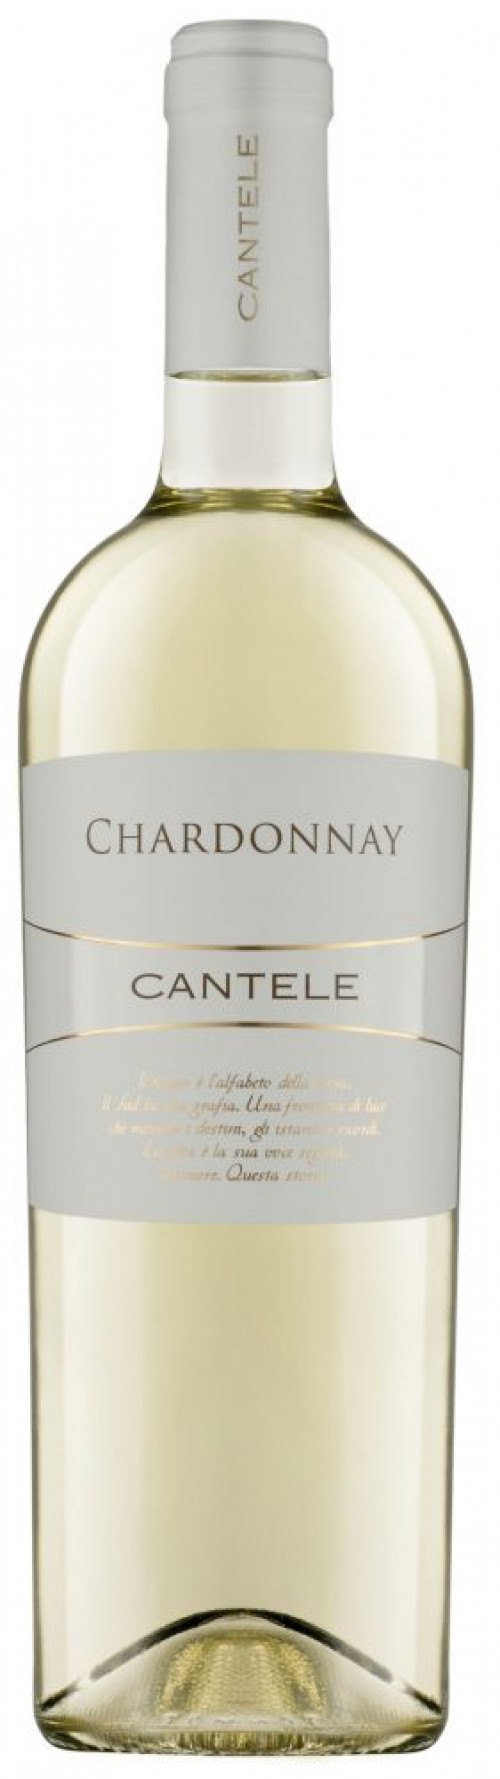 2019 Cantele Chardonnay Salento 750ml